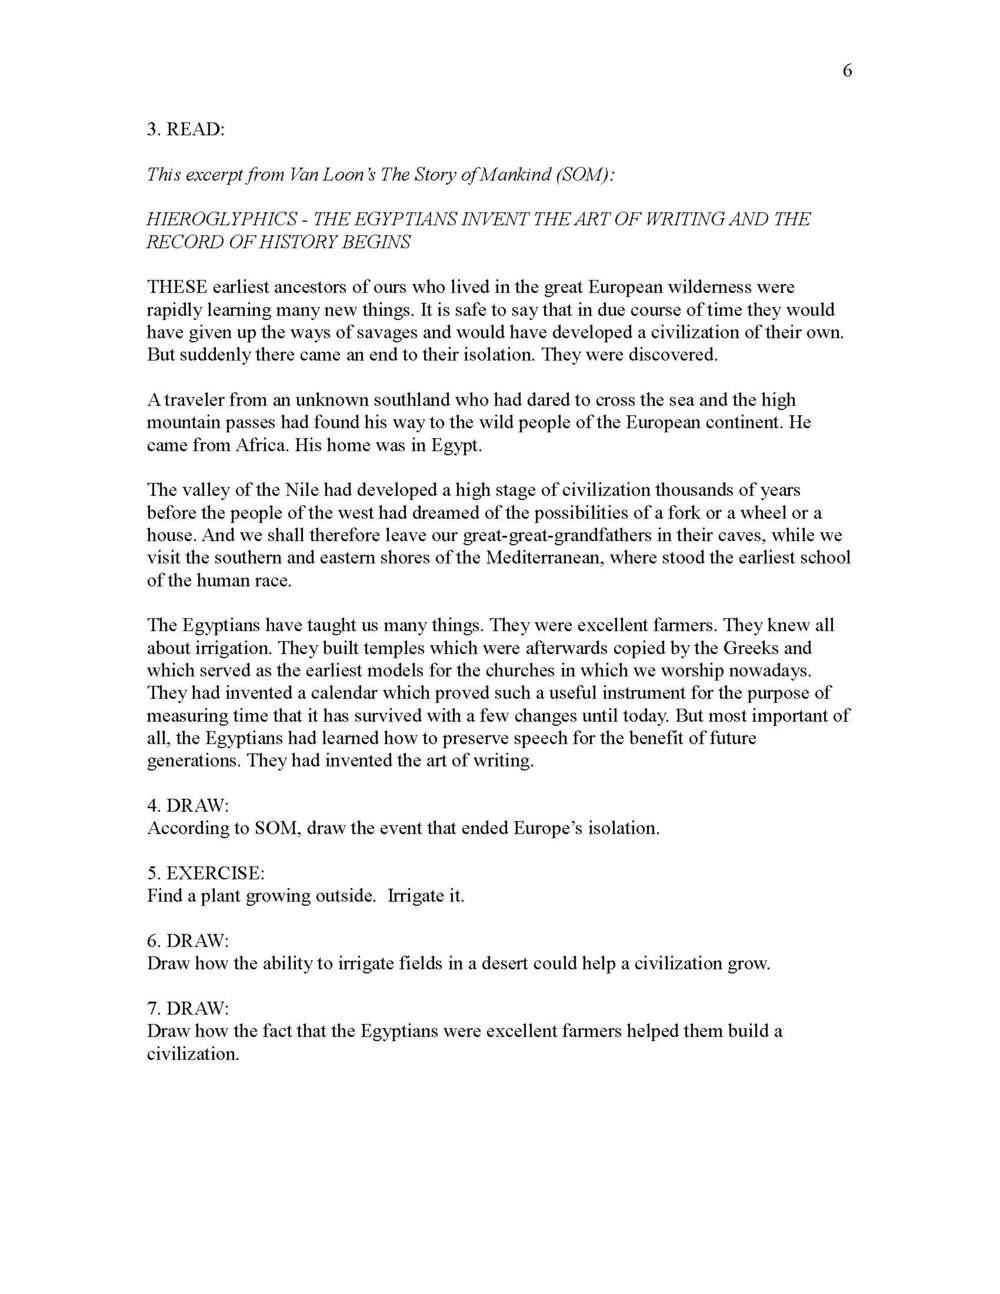 Step 3 History 2 - Egypt_Page_07.jpg